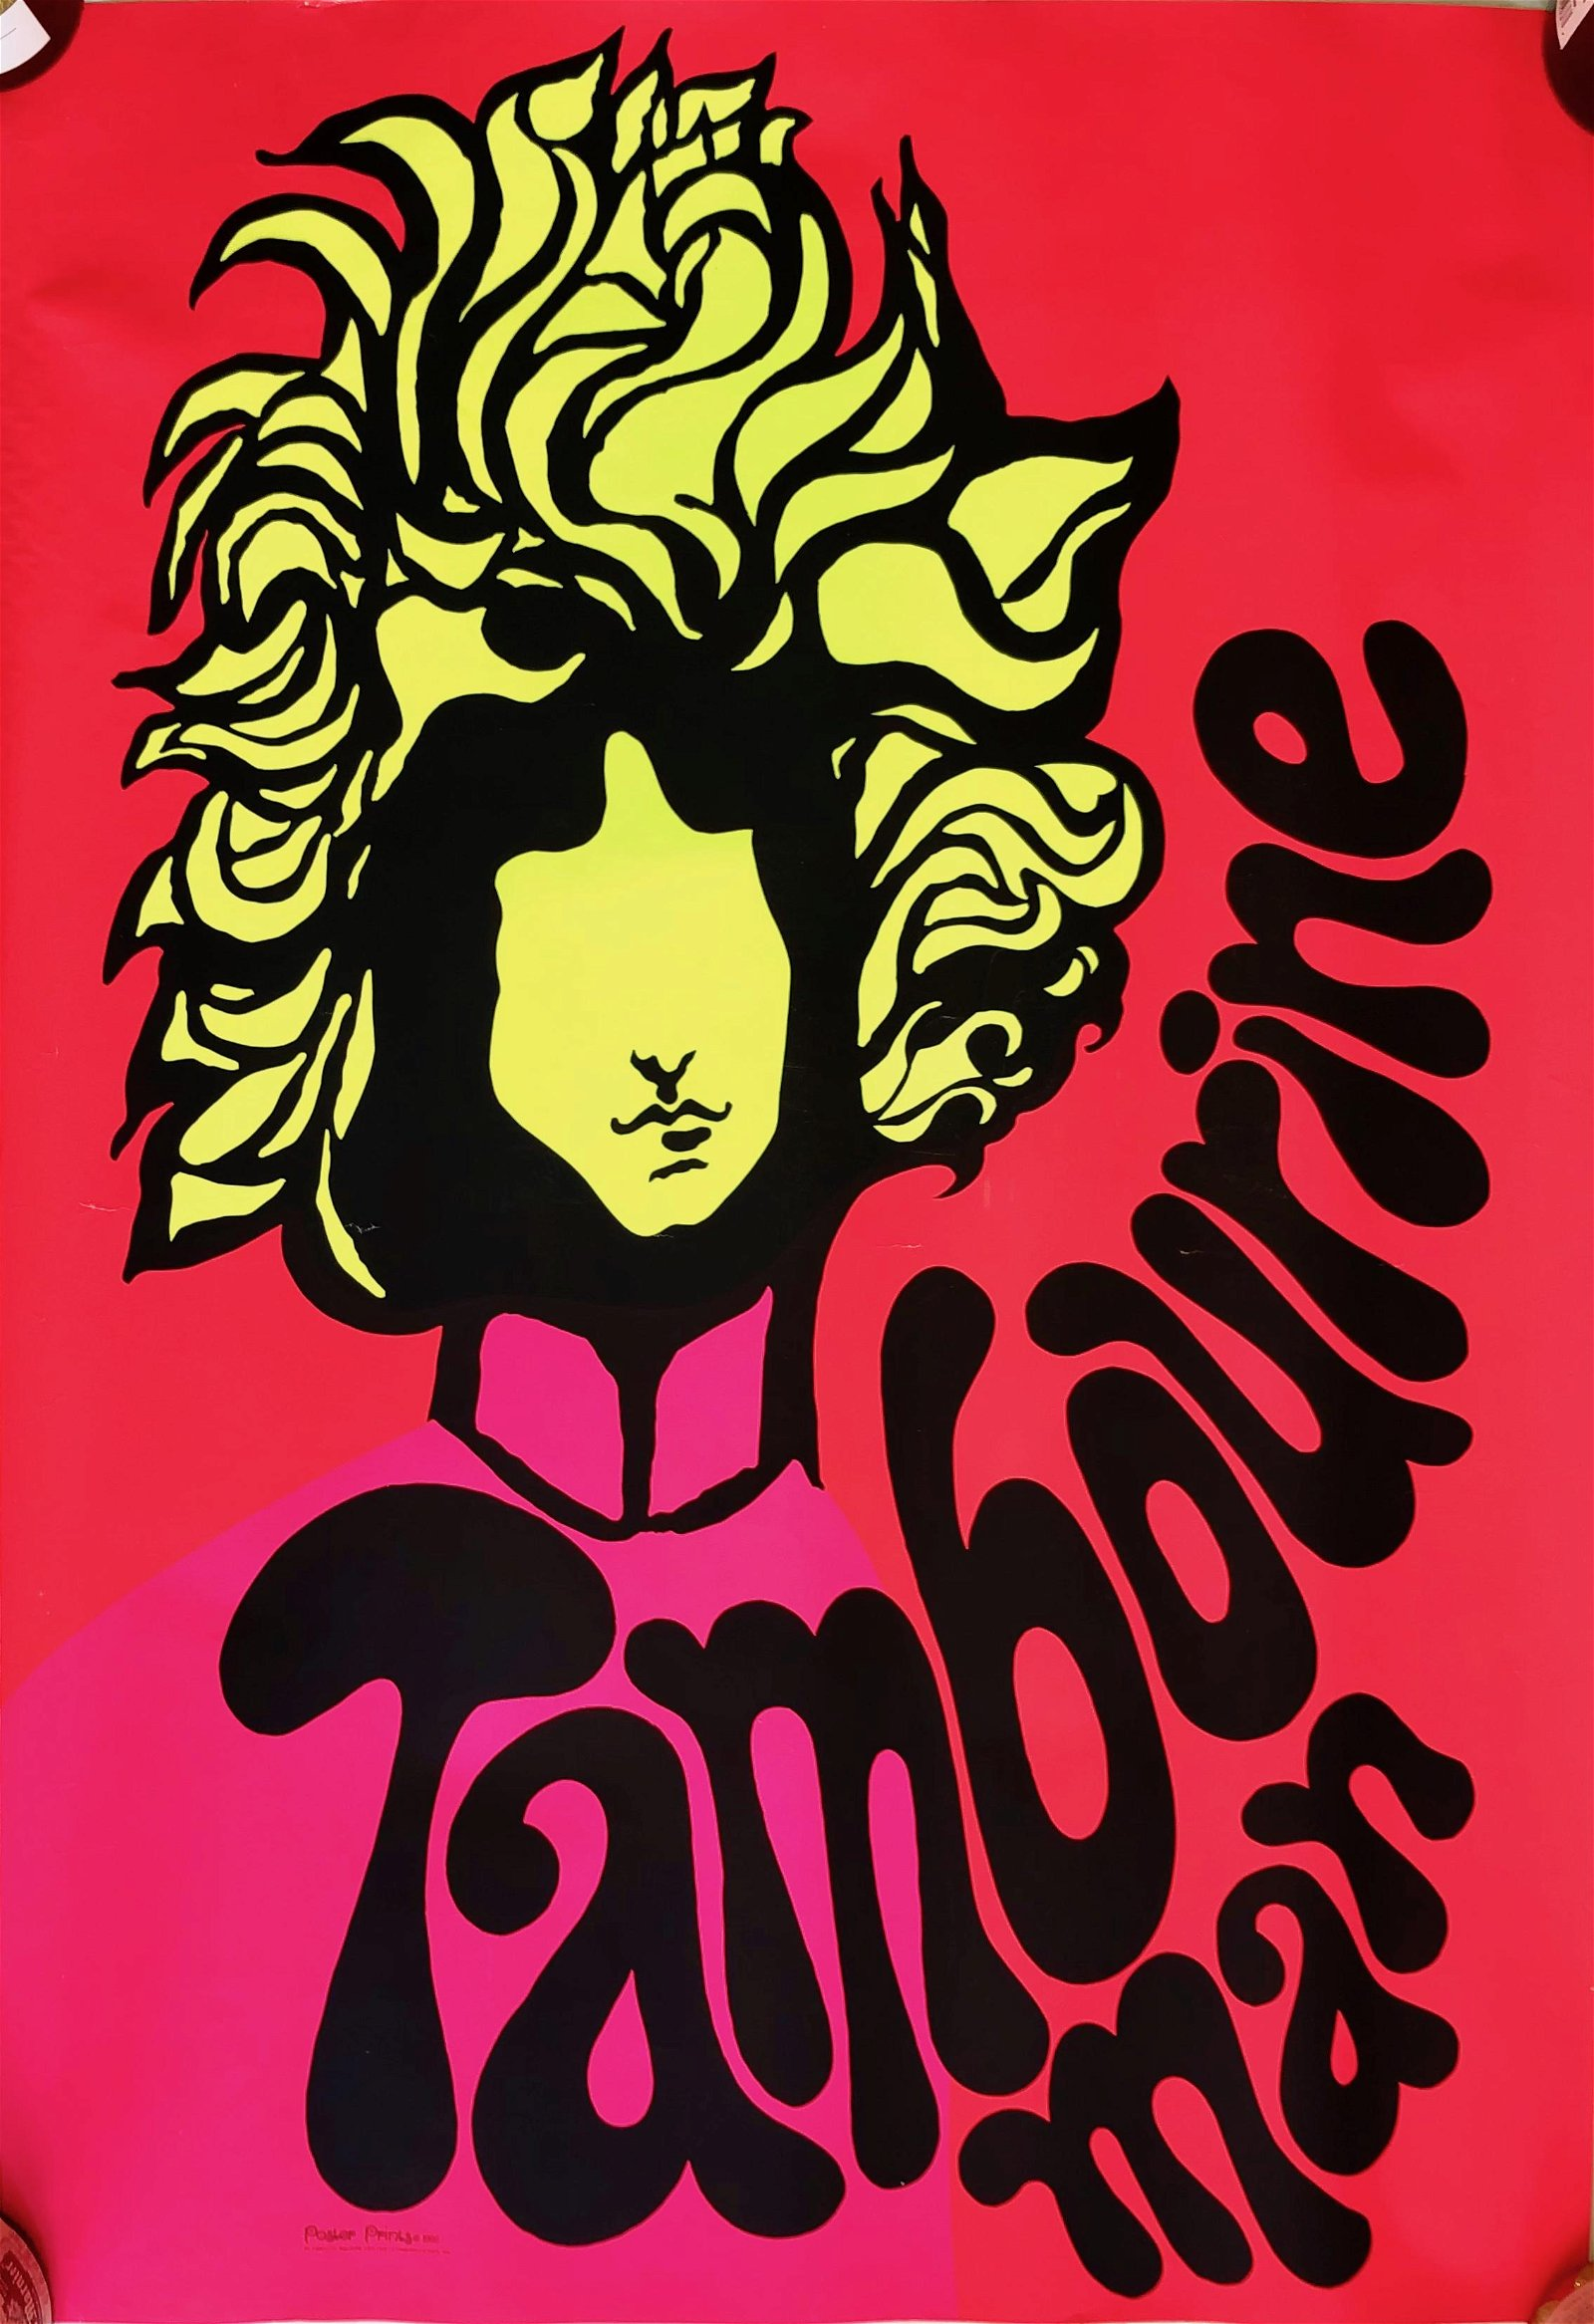 DYLAN Tambourine Man Blacklight Poster, D. Shupe 1969